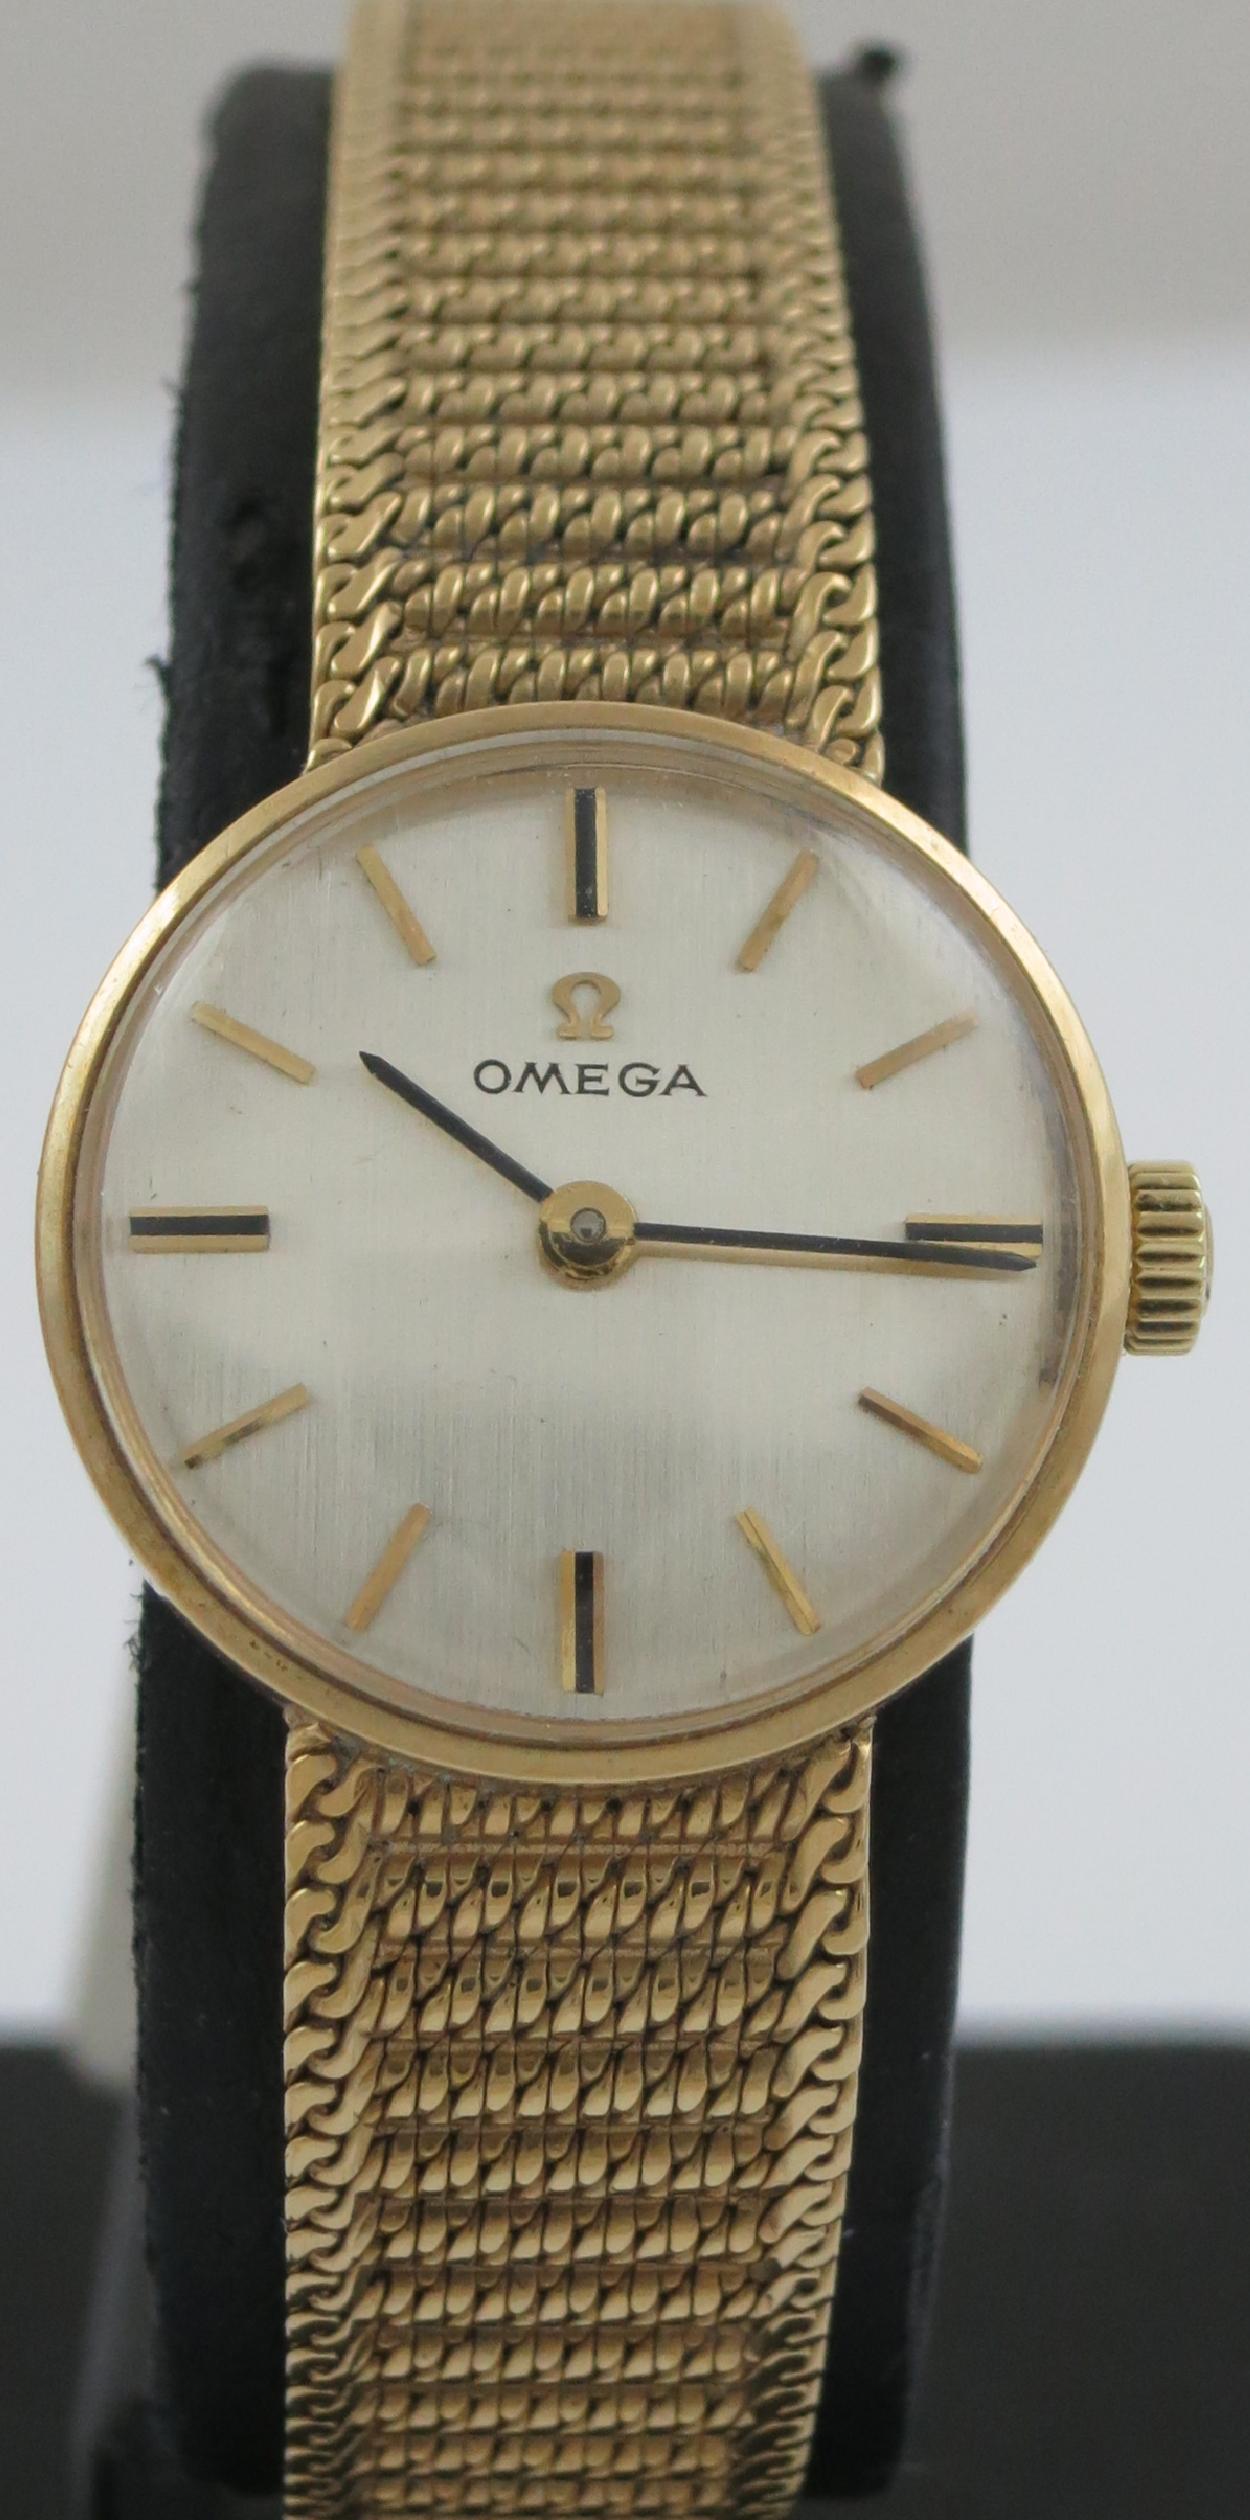 LADIES OMEGA MECHANICAL 9CT GOLD BRACELET WATCH